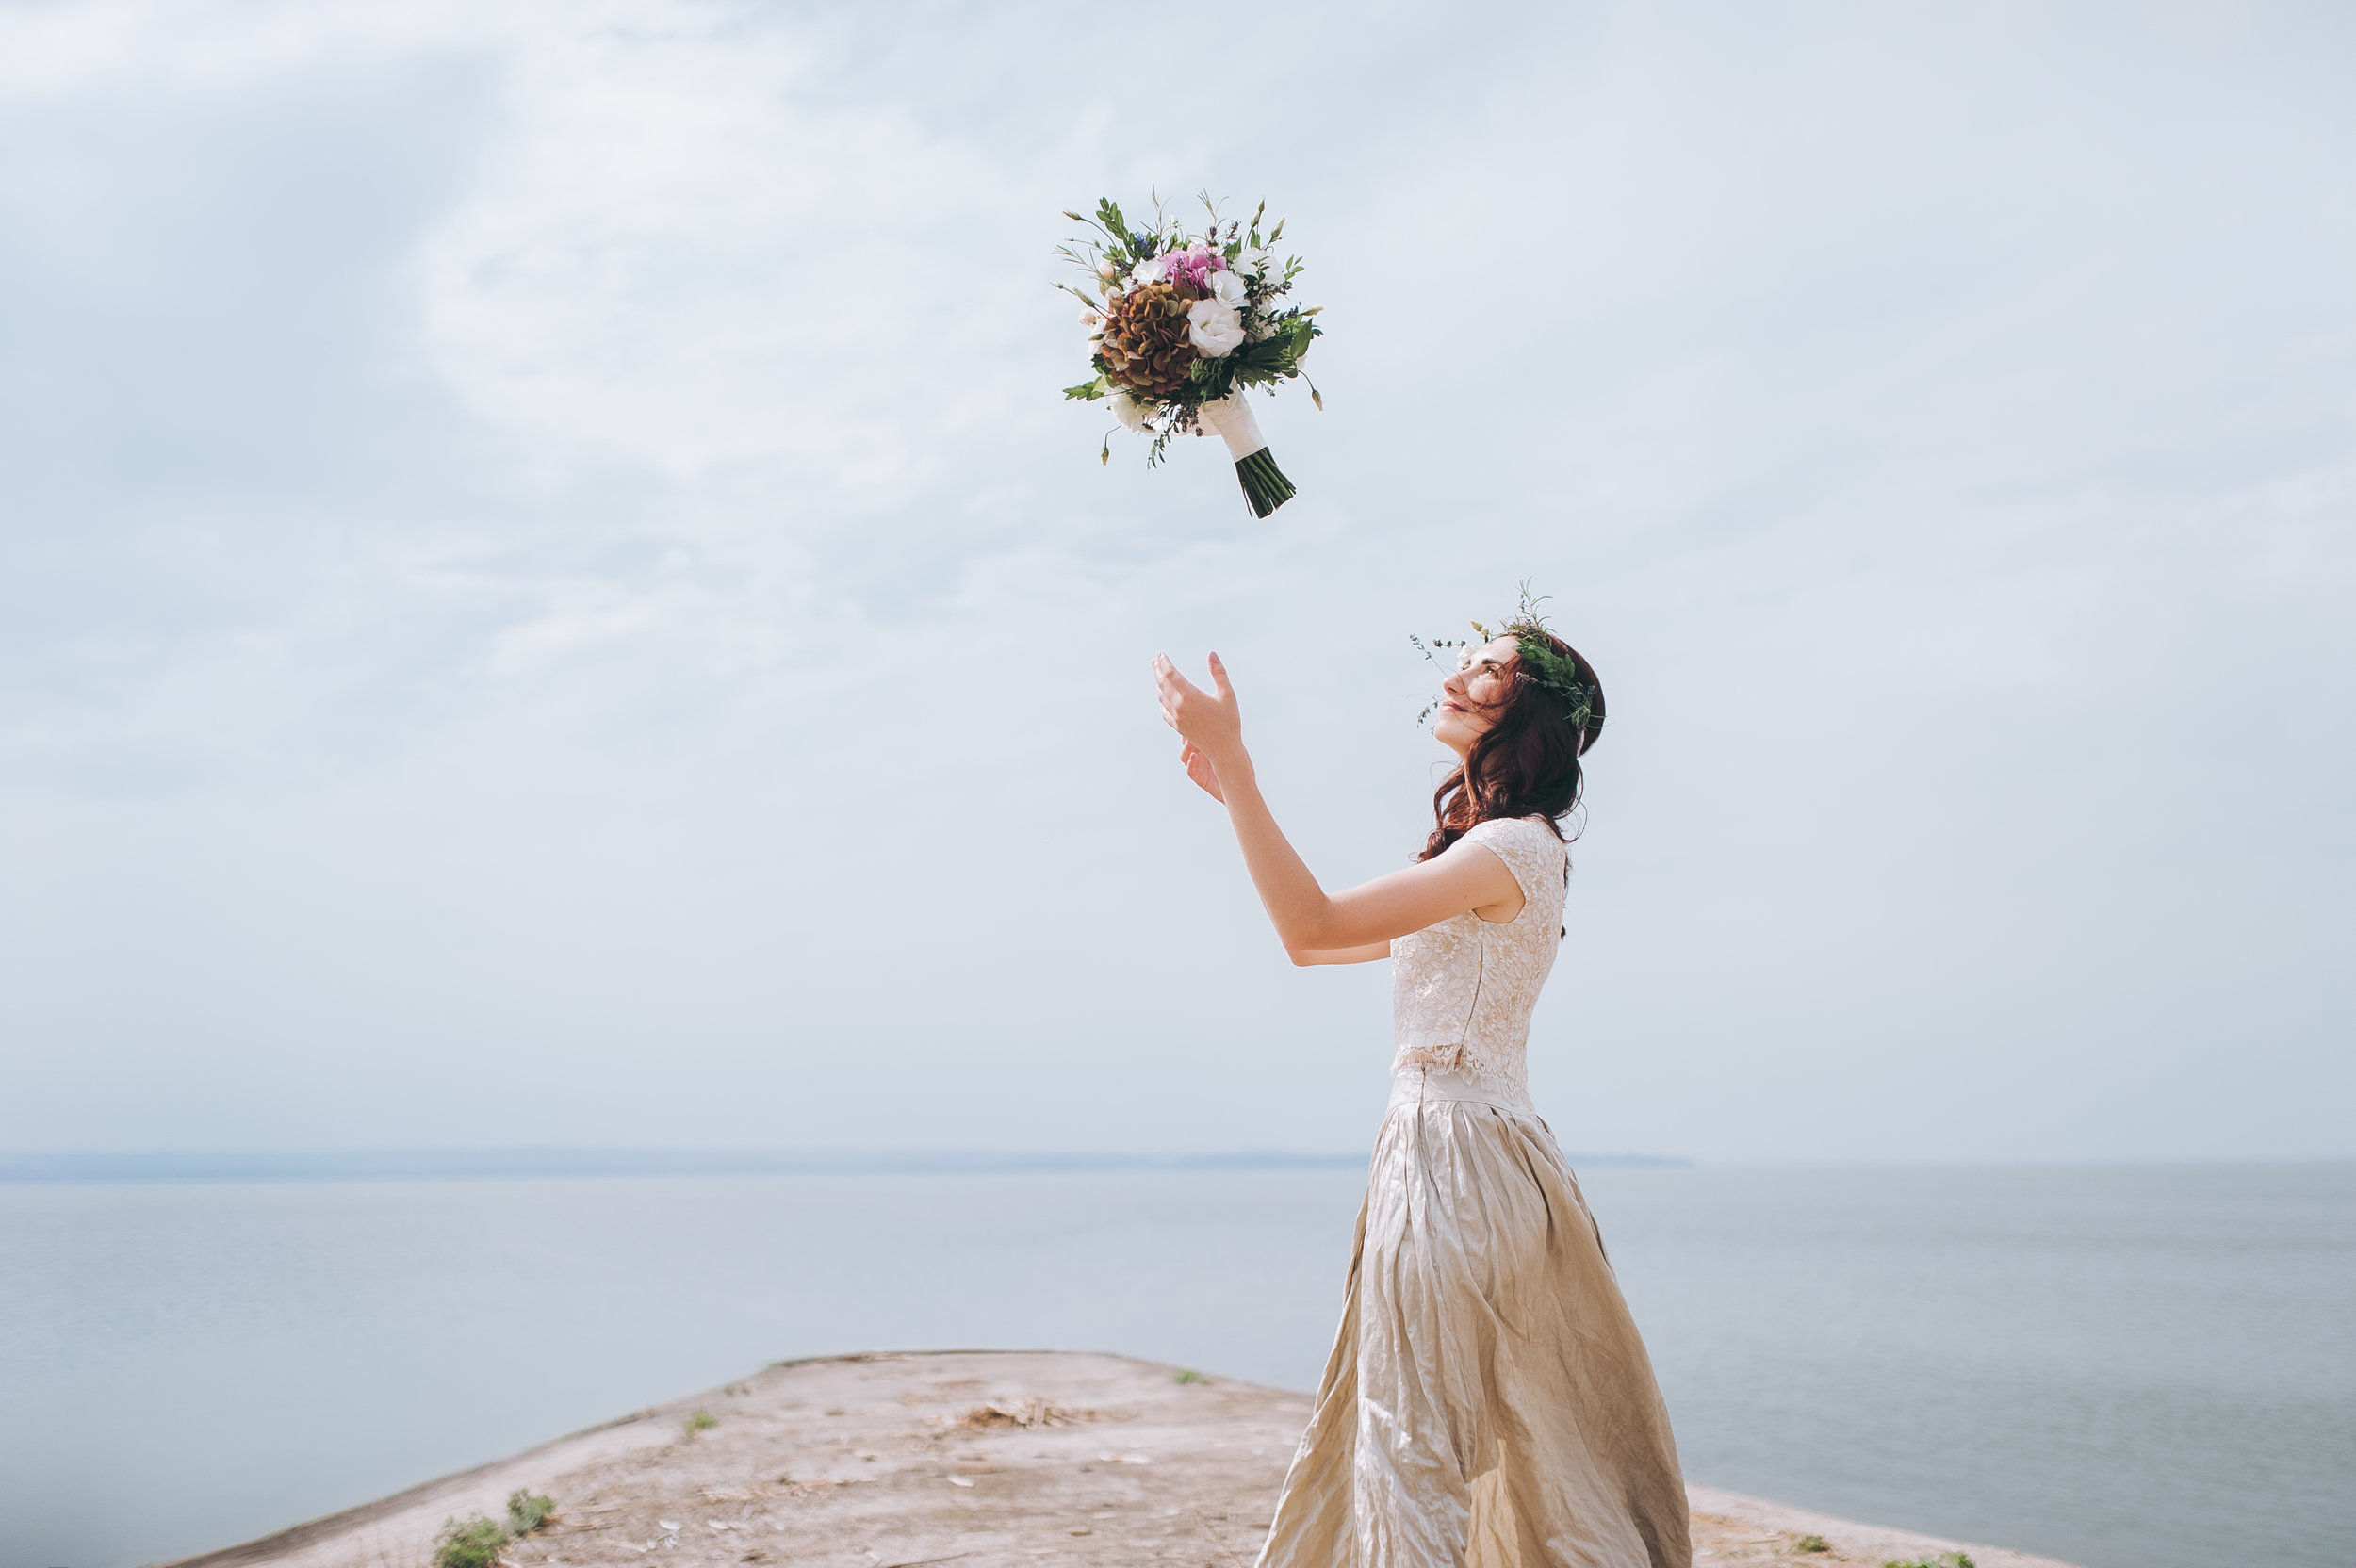 Pinterest Marketing for Wedding Photographers